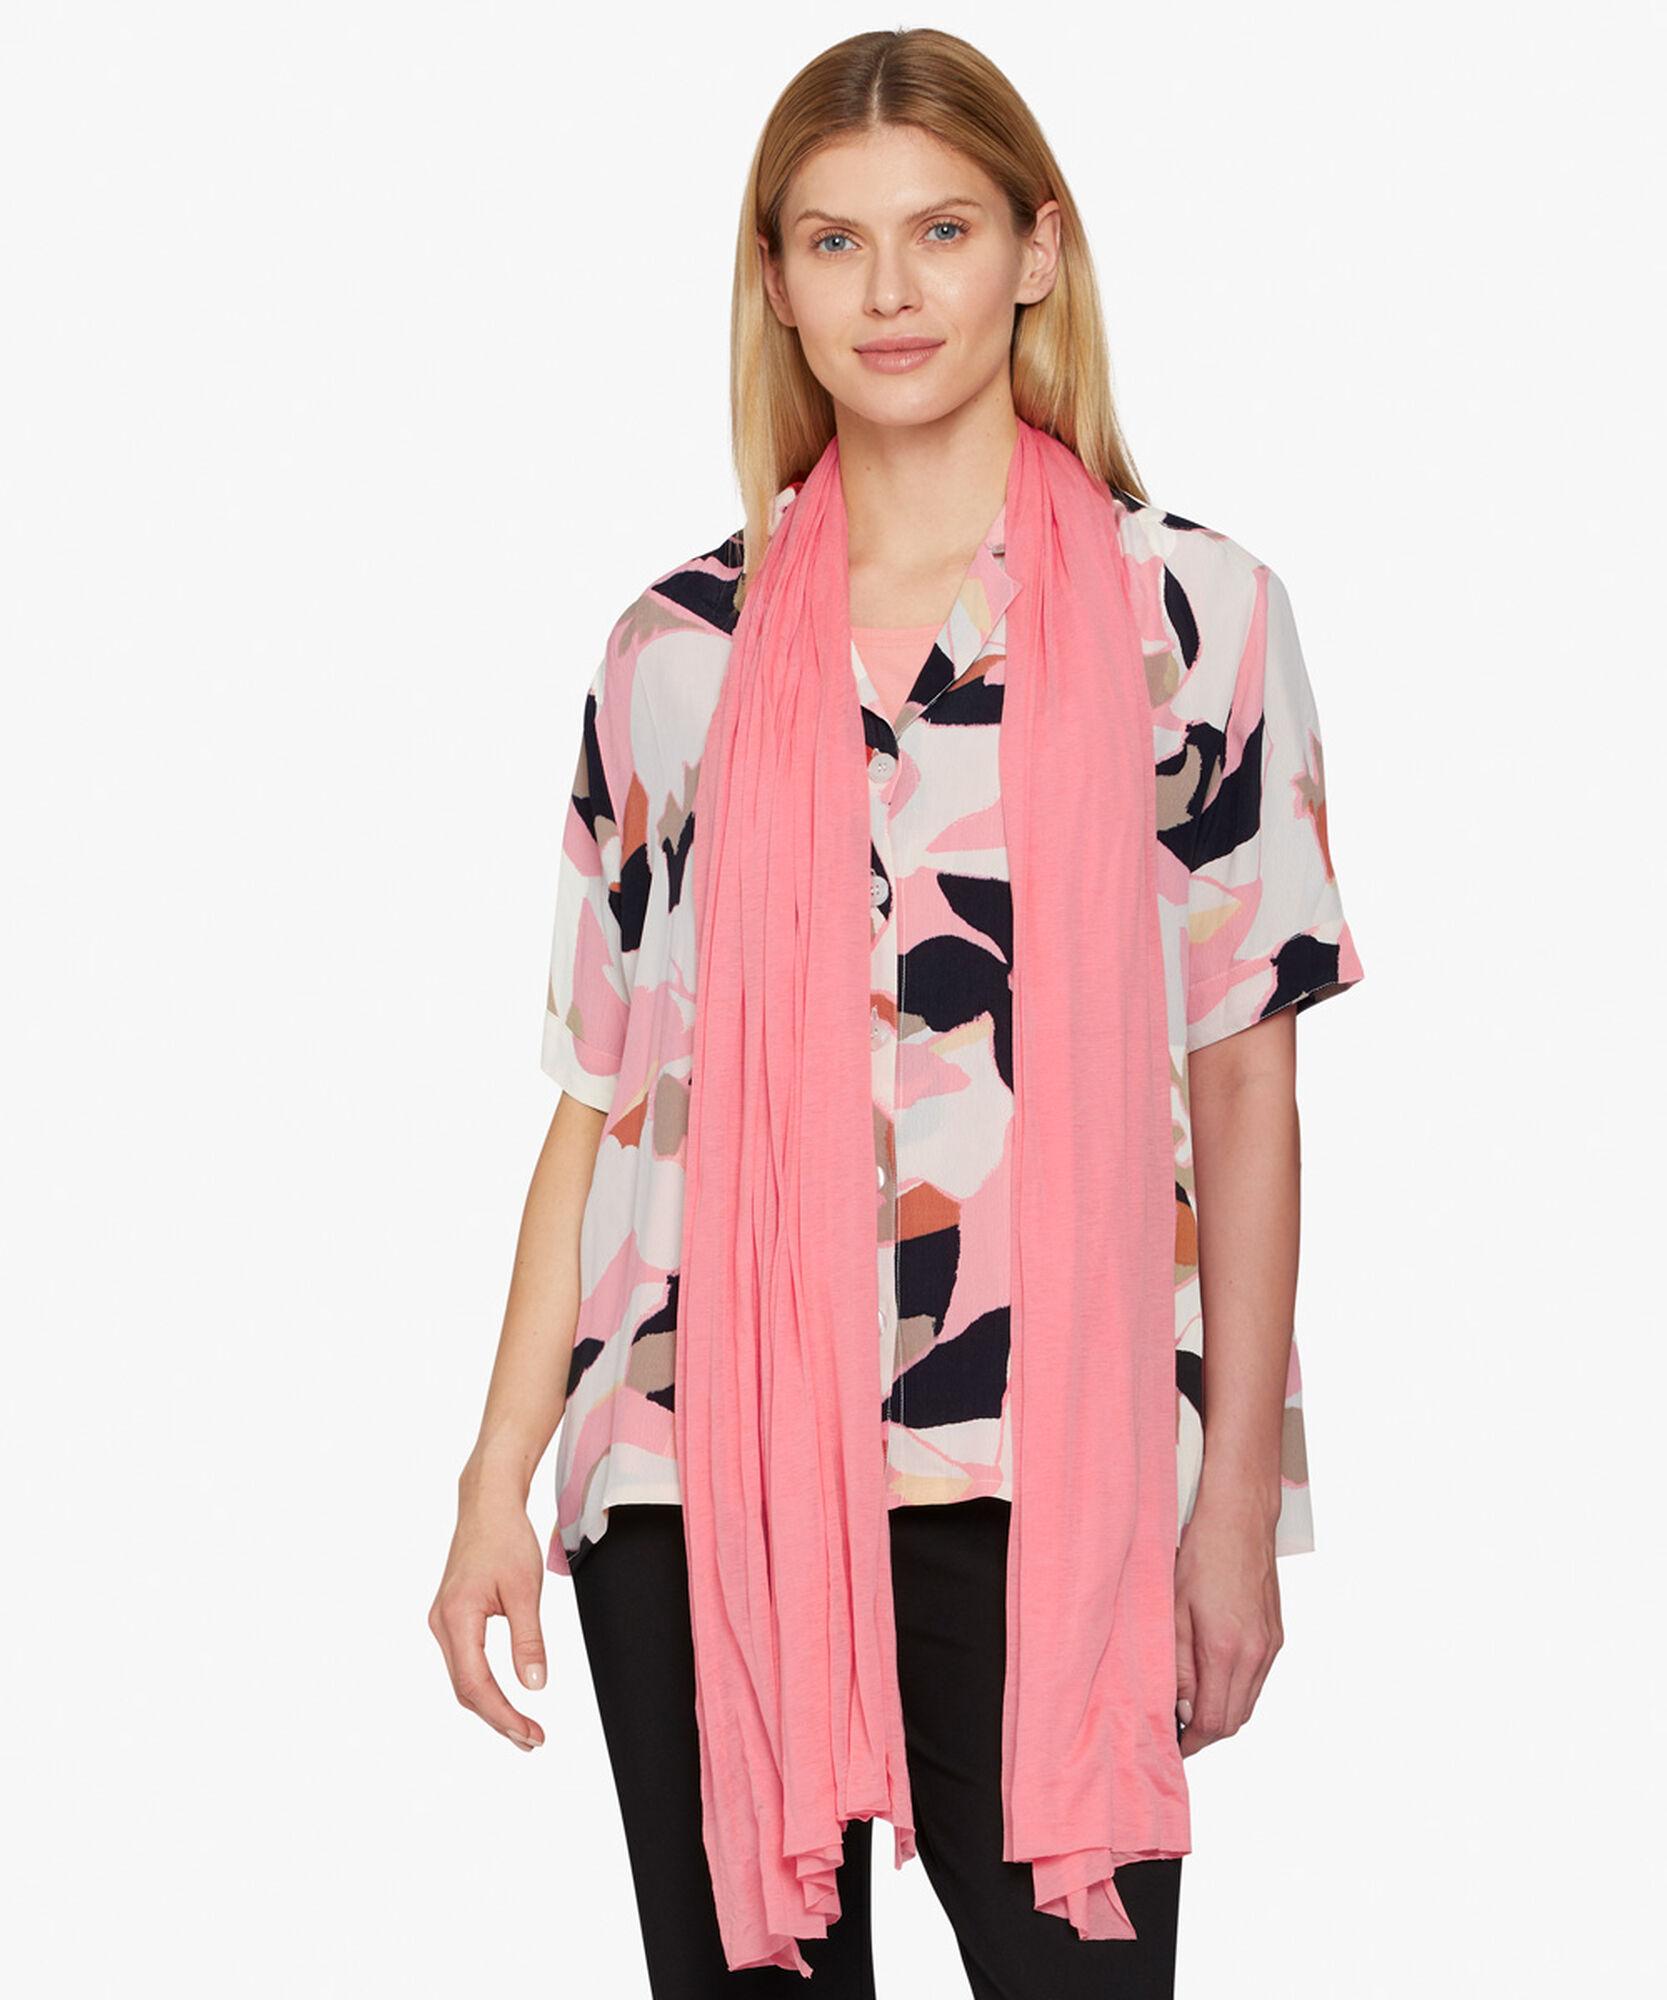 AMEGA SCARF, Peach Blossom, hi-res